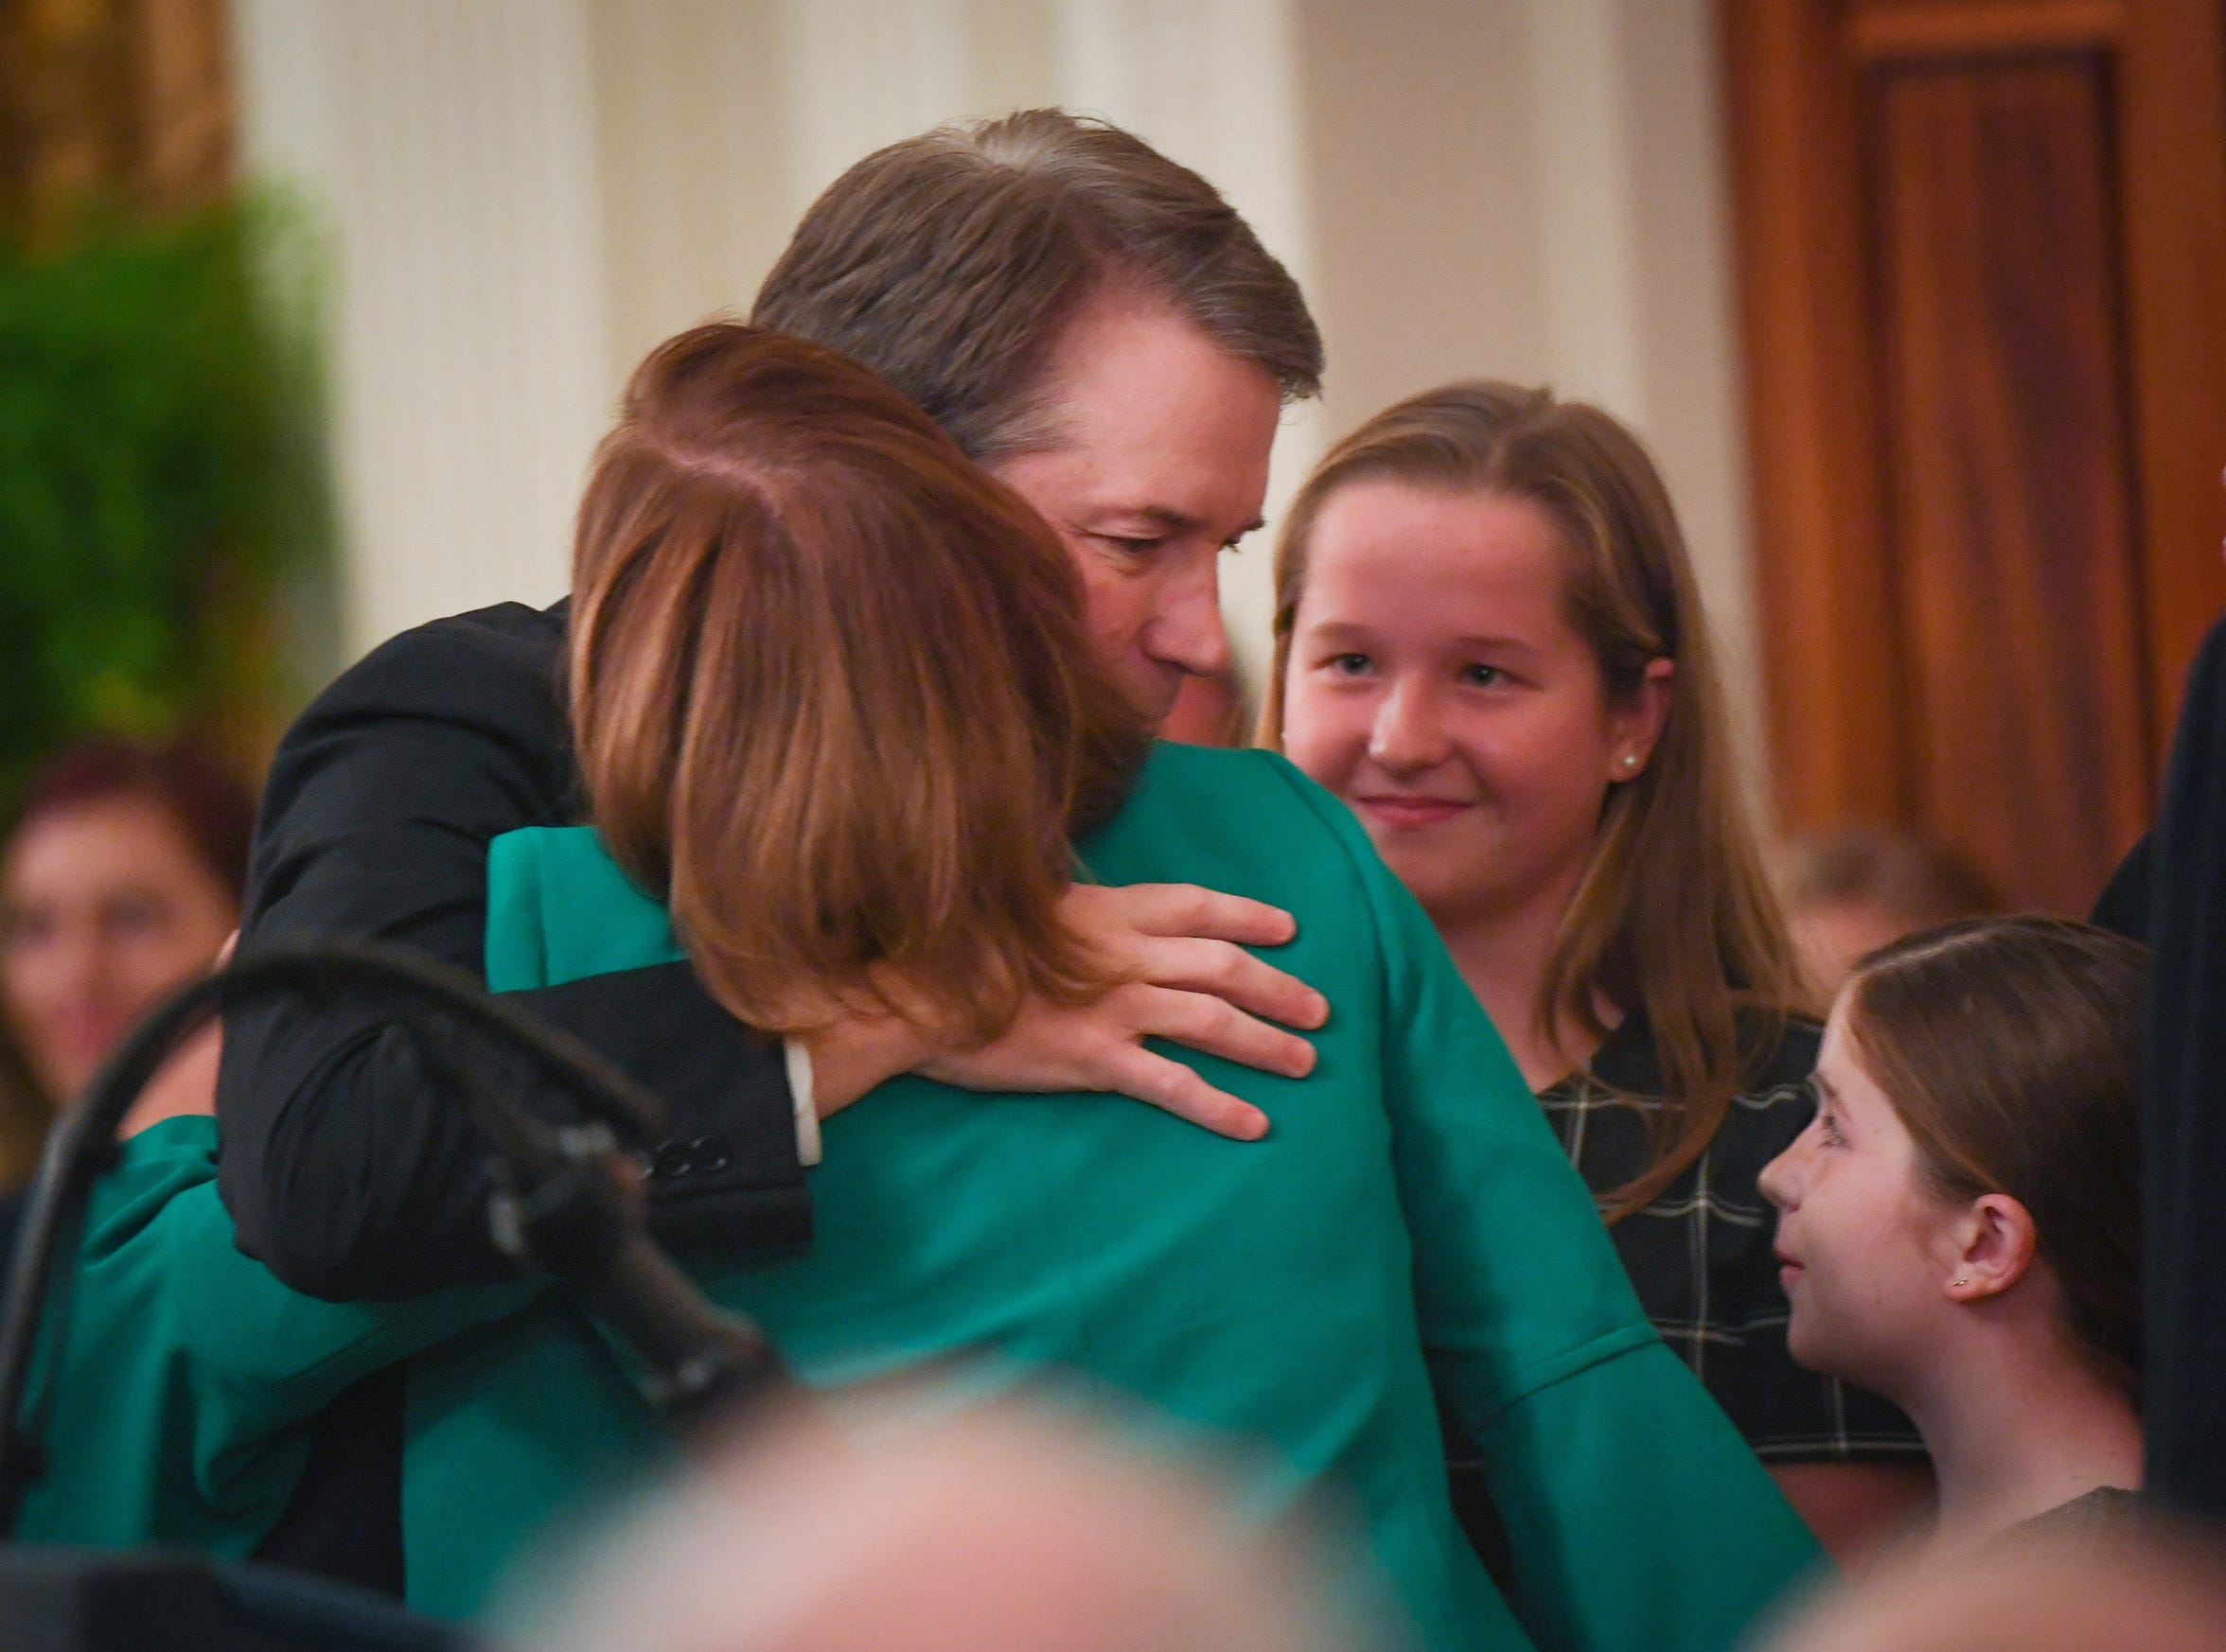 Justice Brett Kavanaugh hugs his wife Ashley Kavanaugh alongside their daughters Liza Kavanaugh and Margaret Kavanaugh during the ceremony.